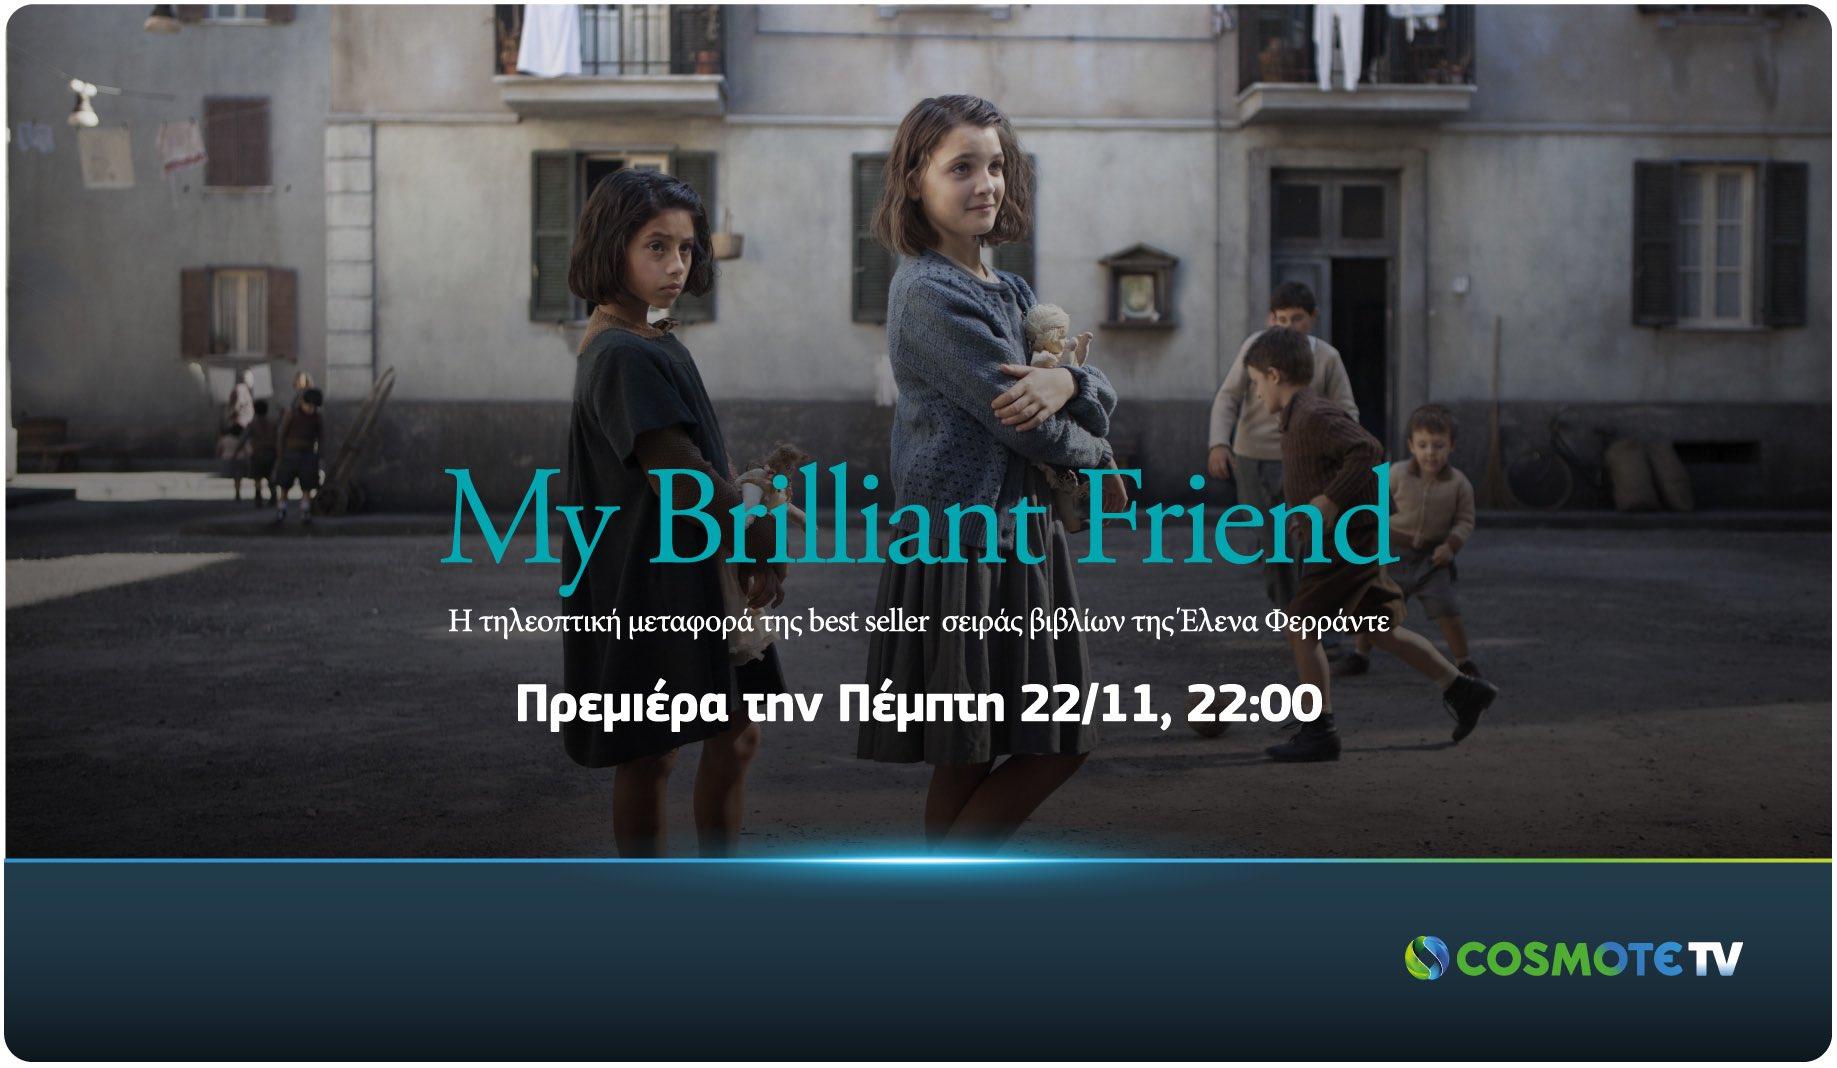 """My Brilliant Friend"": Η τηλεοπτική μεταφορά της best seller σειράς βιβλίων της Έλενα Φερράντε στην COSMOTE TV"